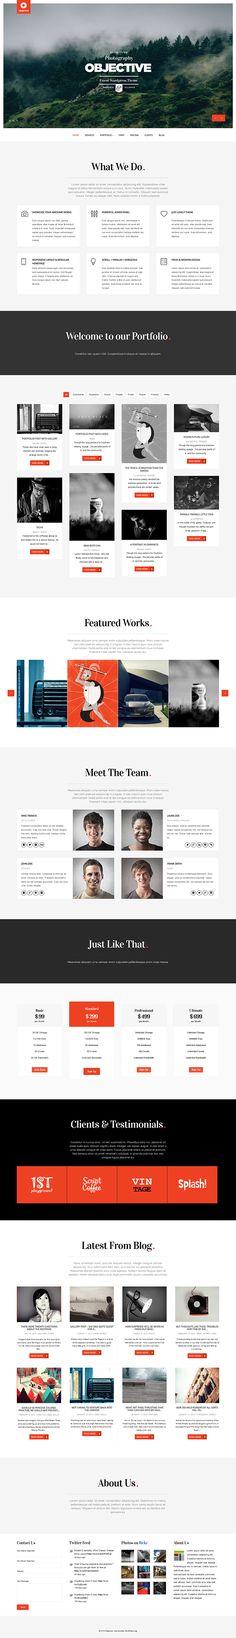 Objective - Responsive Portfolio Photography Theme on Behance